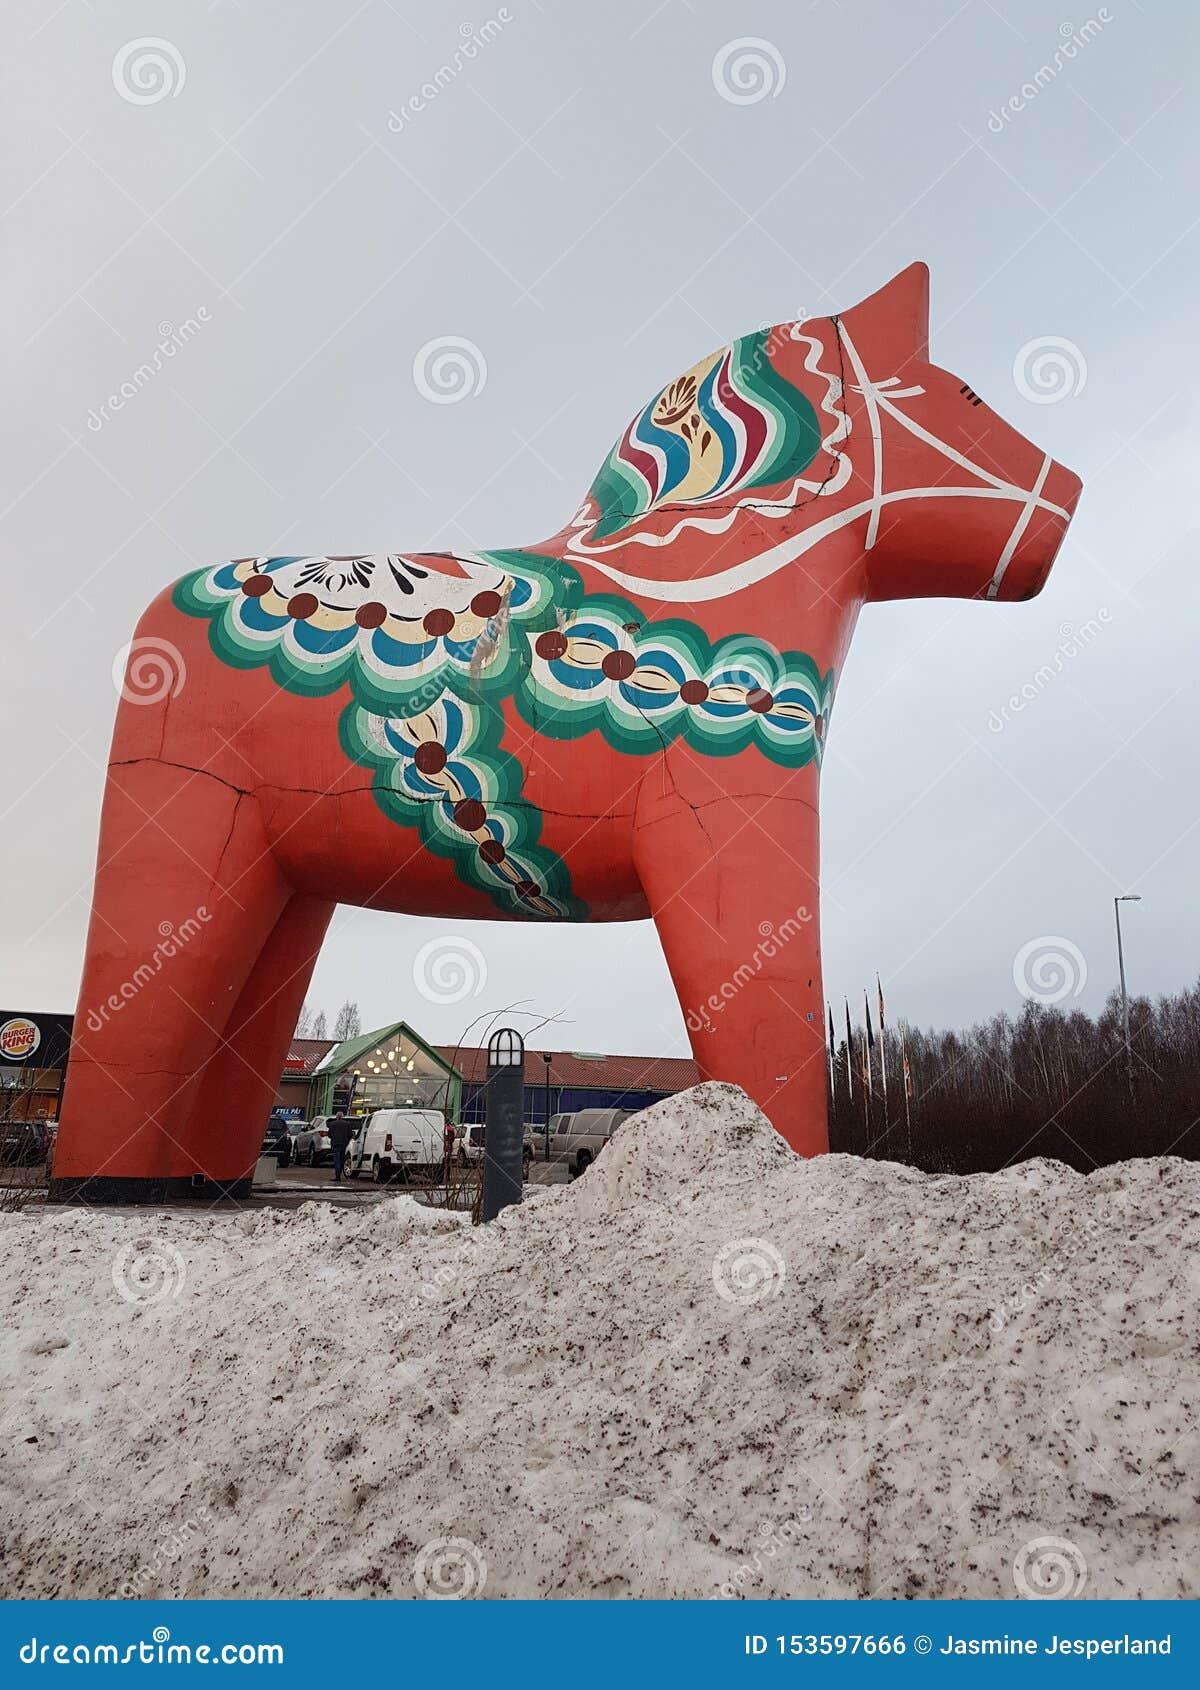 Horse in north Sweden.